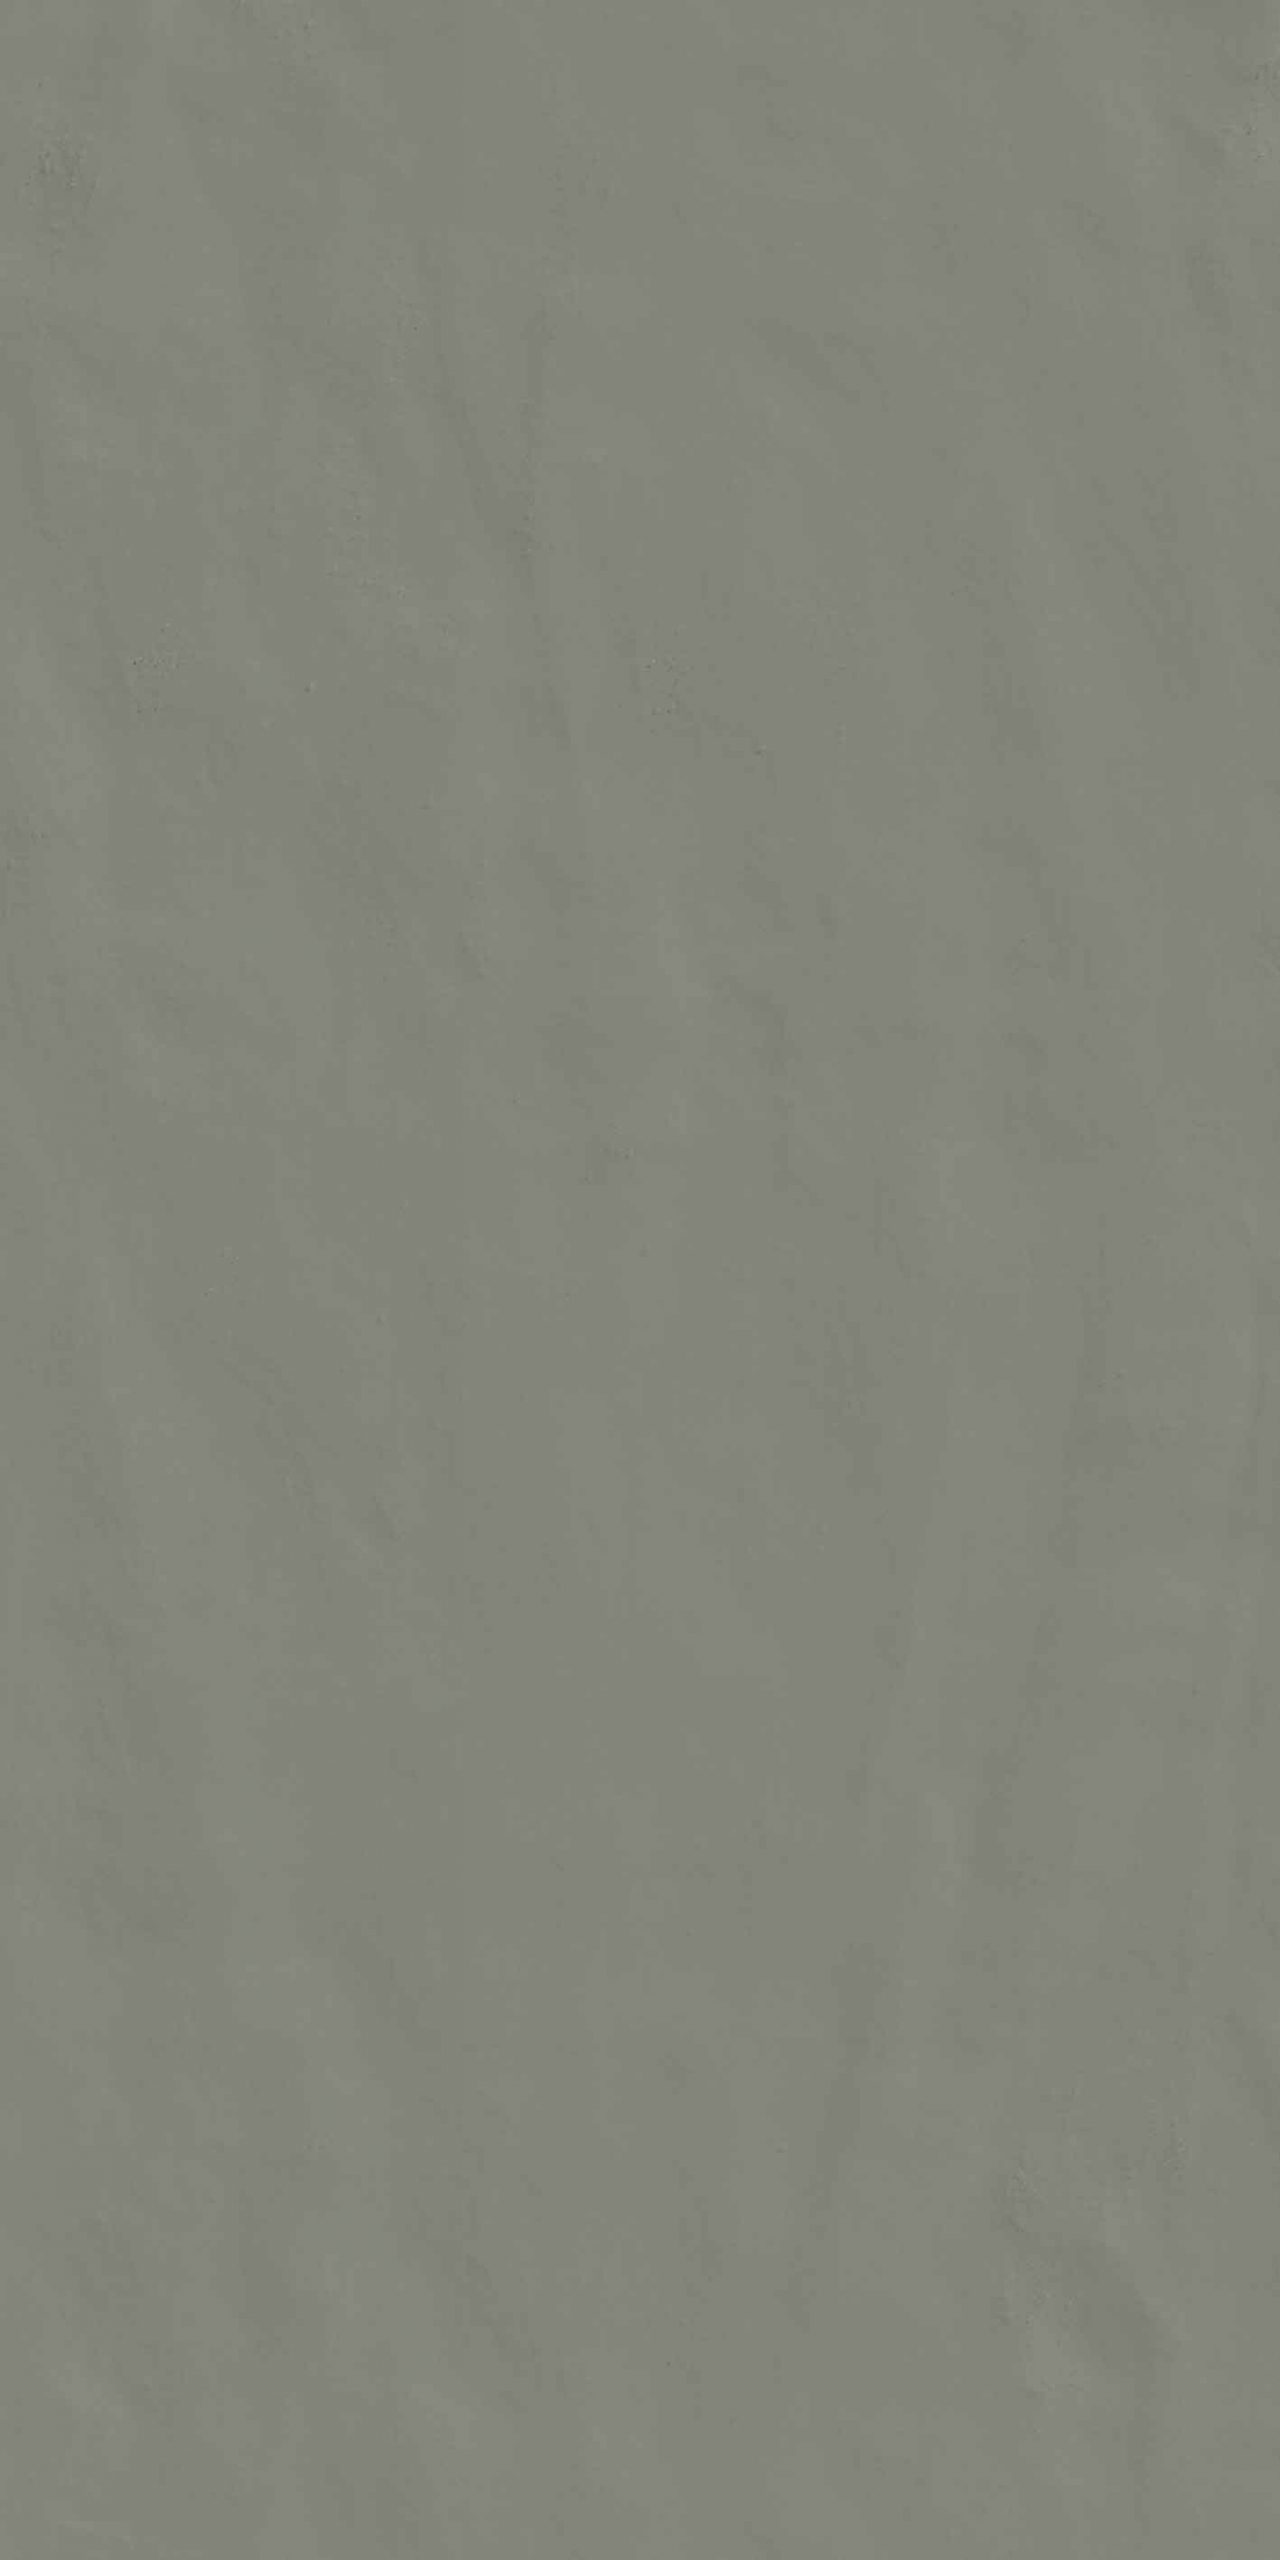 Neutra 6.0 Grafite 06 Matte 10mm 60 x 120